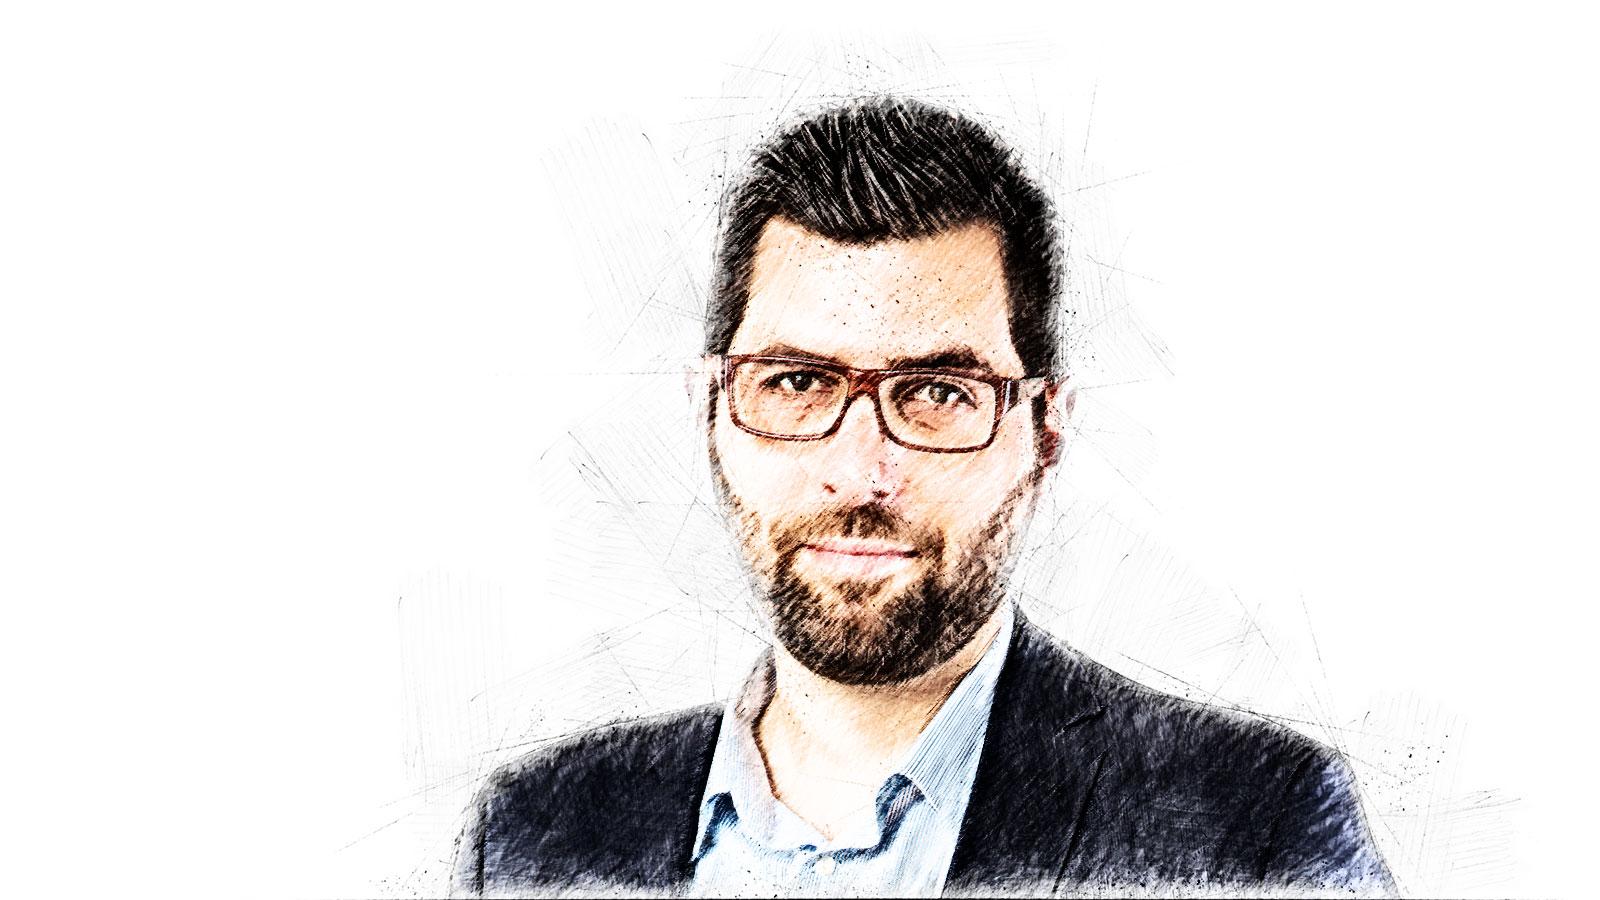 Ali Baş, NRW, Die Grünen, Politik, Muslime, MiGAZIN